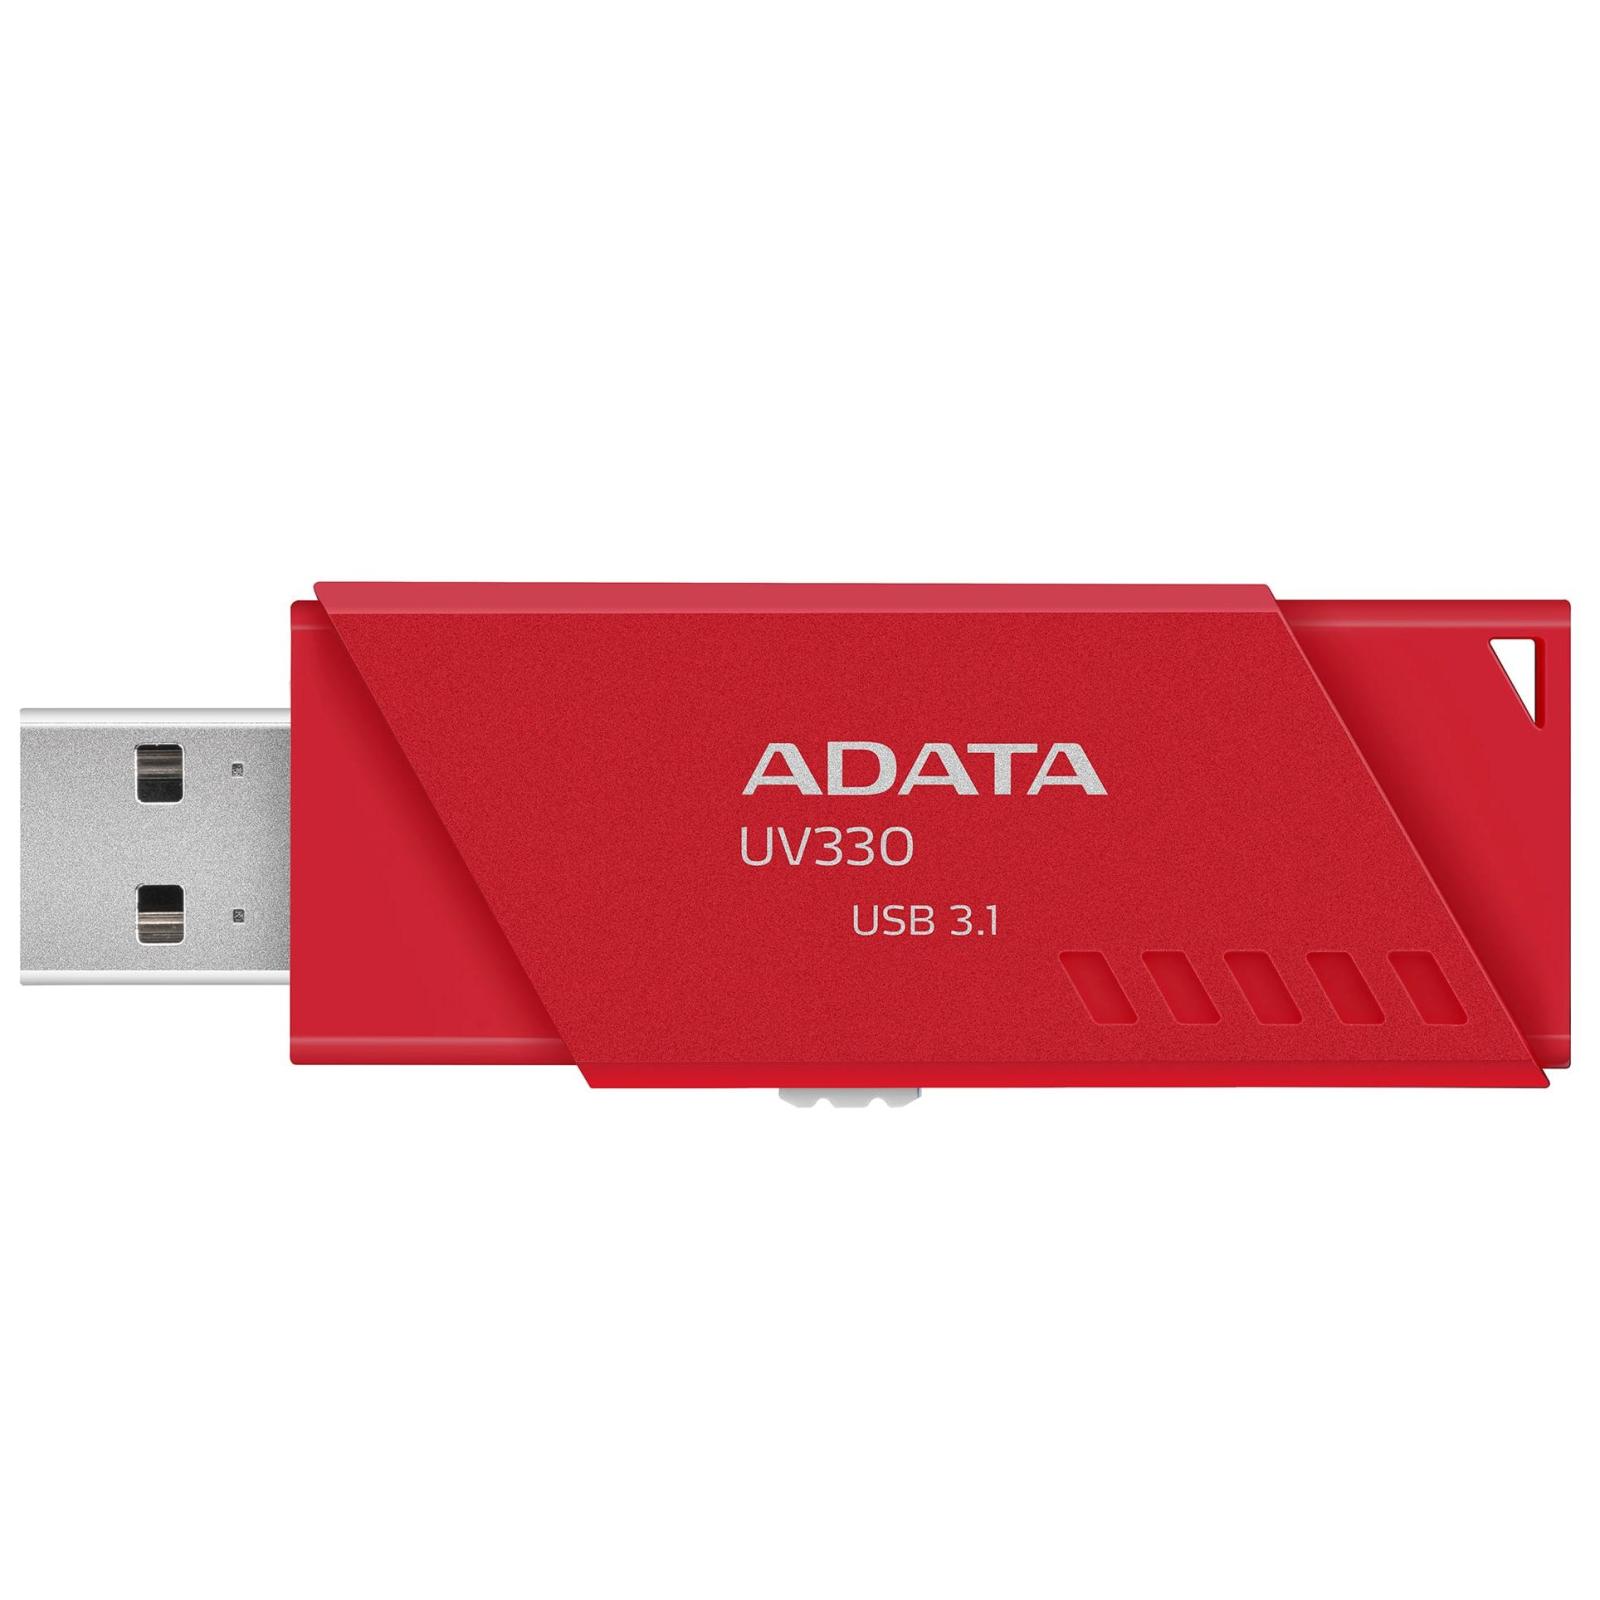 USB флеш накопитель ADATA 32GB UV330 Black USB 3.1 (AUV330-32G-RBK) изображение 2